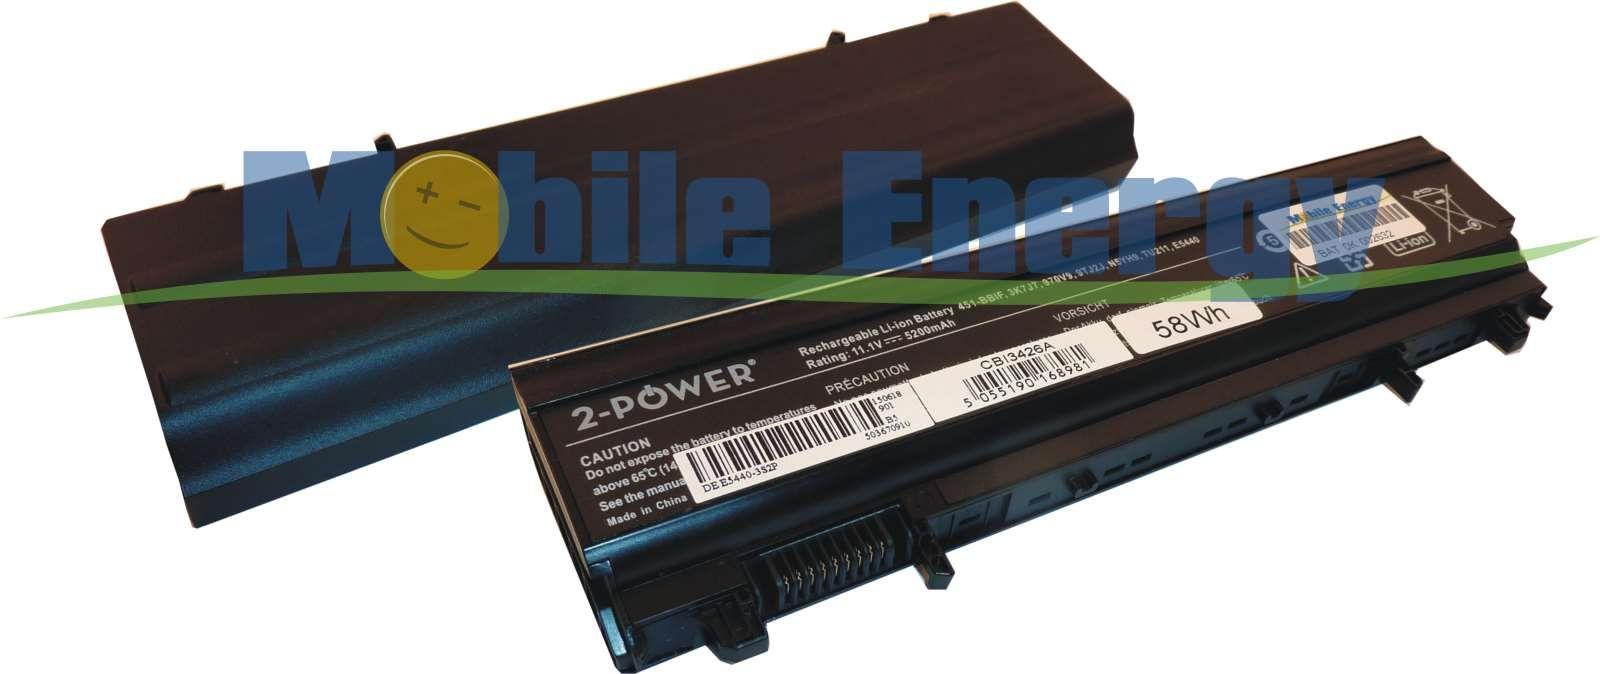 Mobile-Energy Baterie DELL Latitude E5440 / E5540 - 11.1v 5200mA